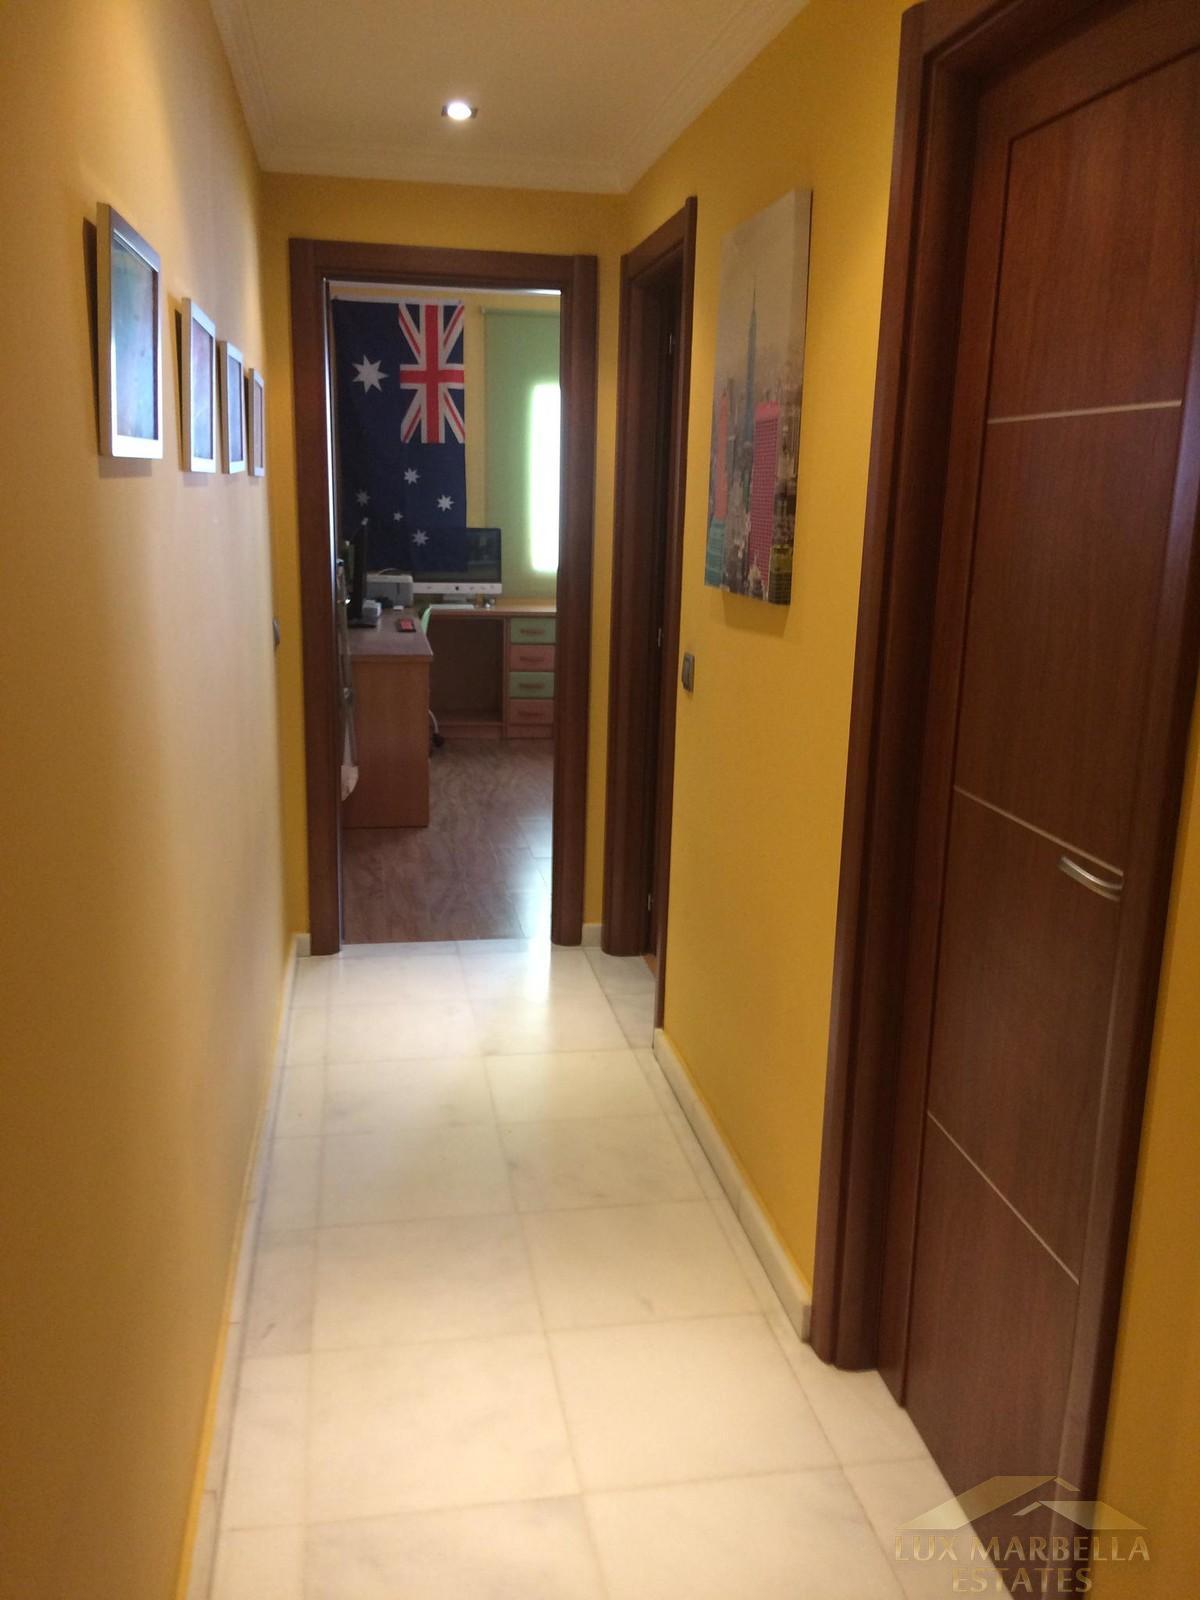 For sale of villa in Fuengirola